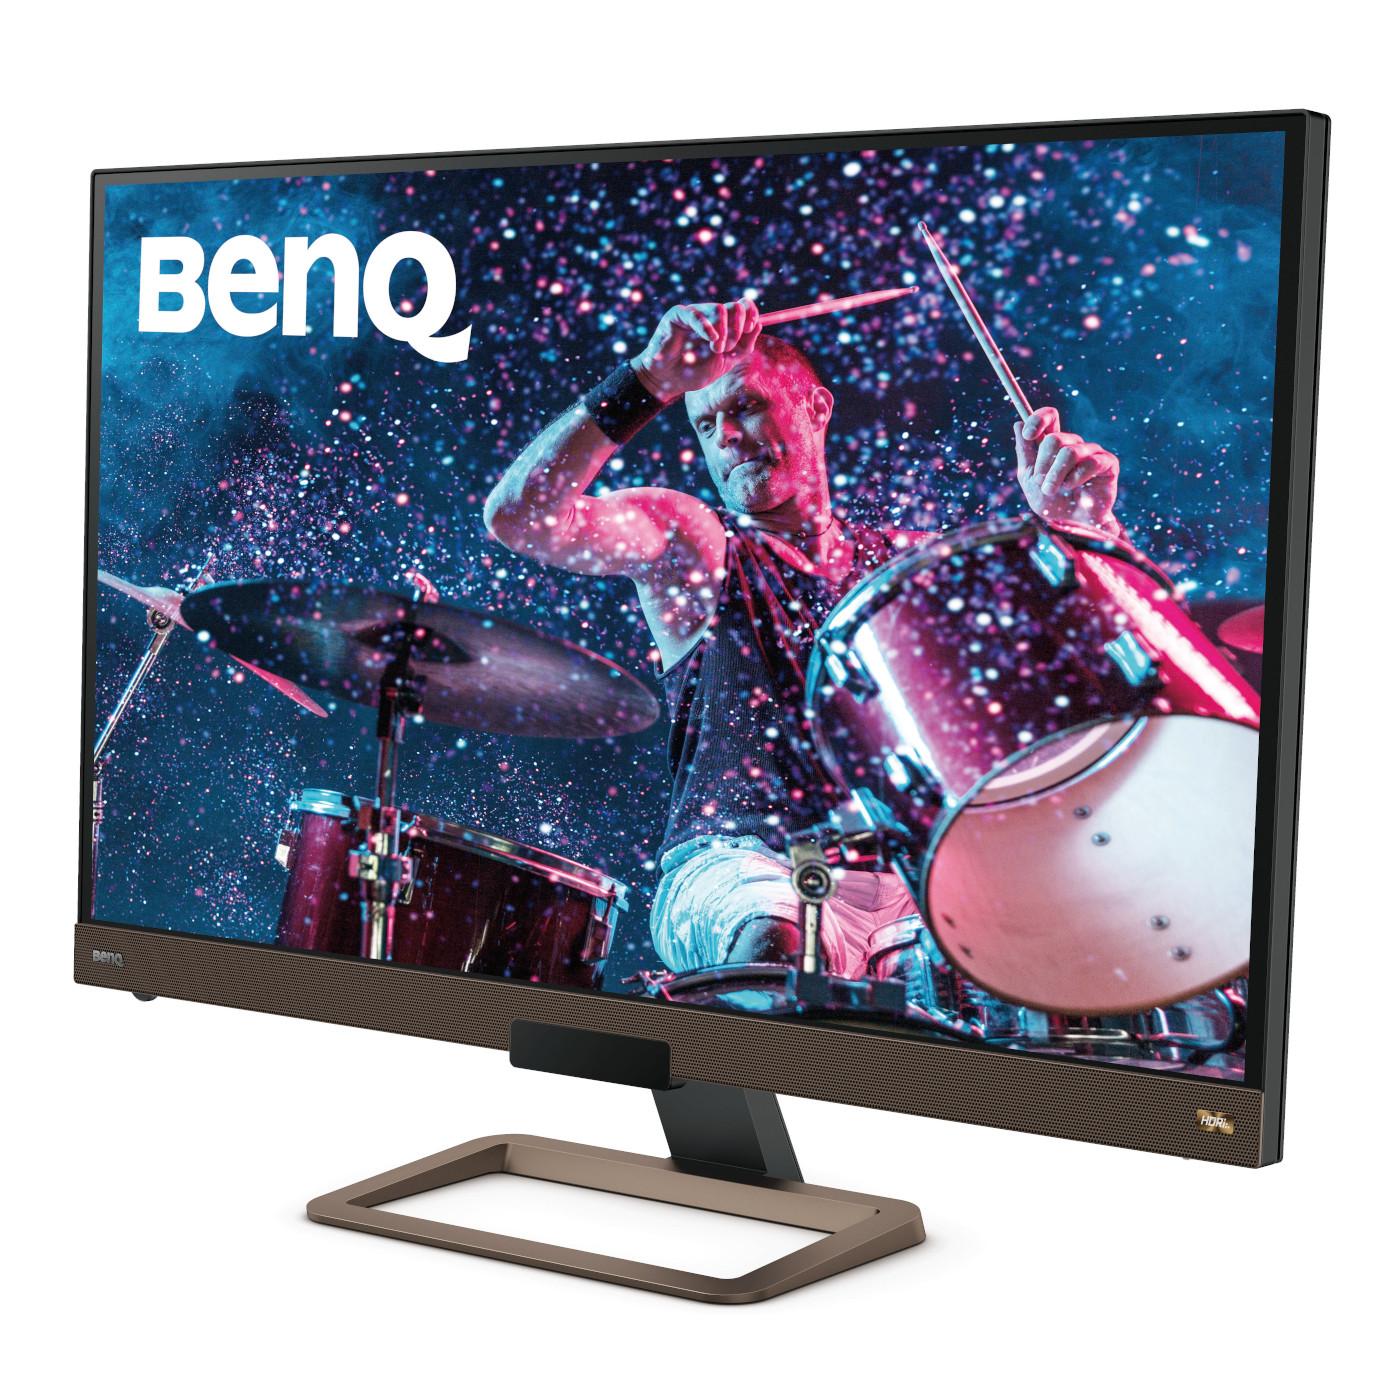 BenQ EW3280U 4K IPS Monitor HDR Freesync for movie entertainment.